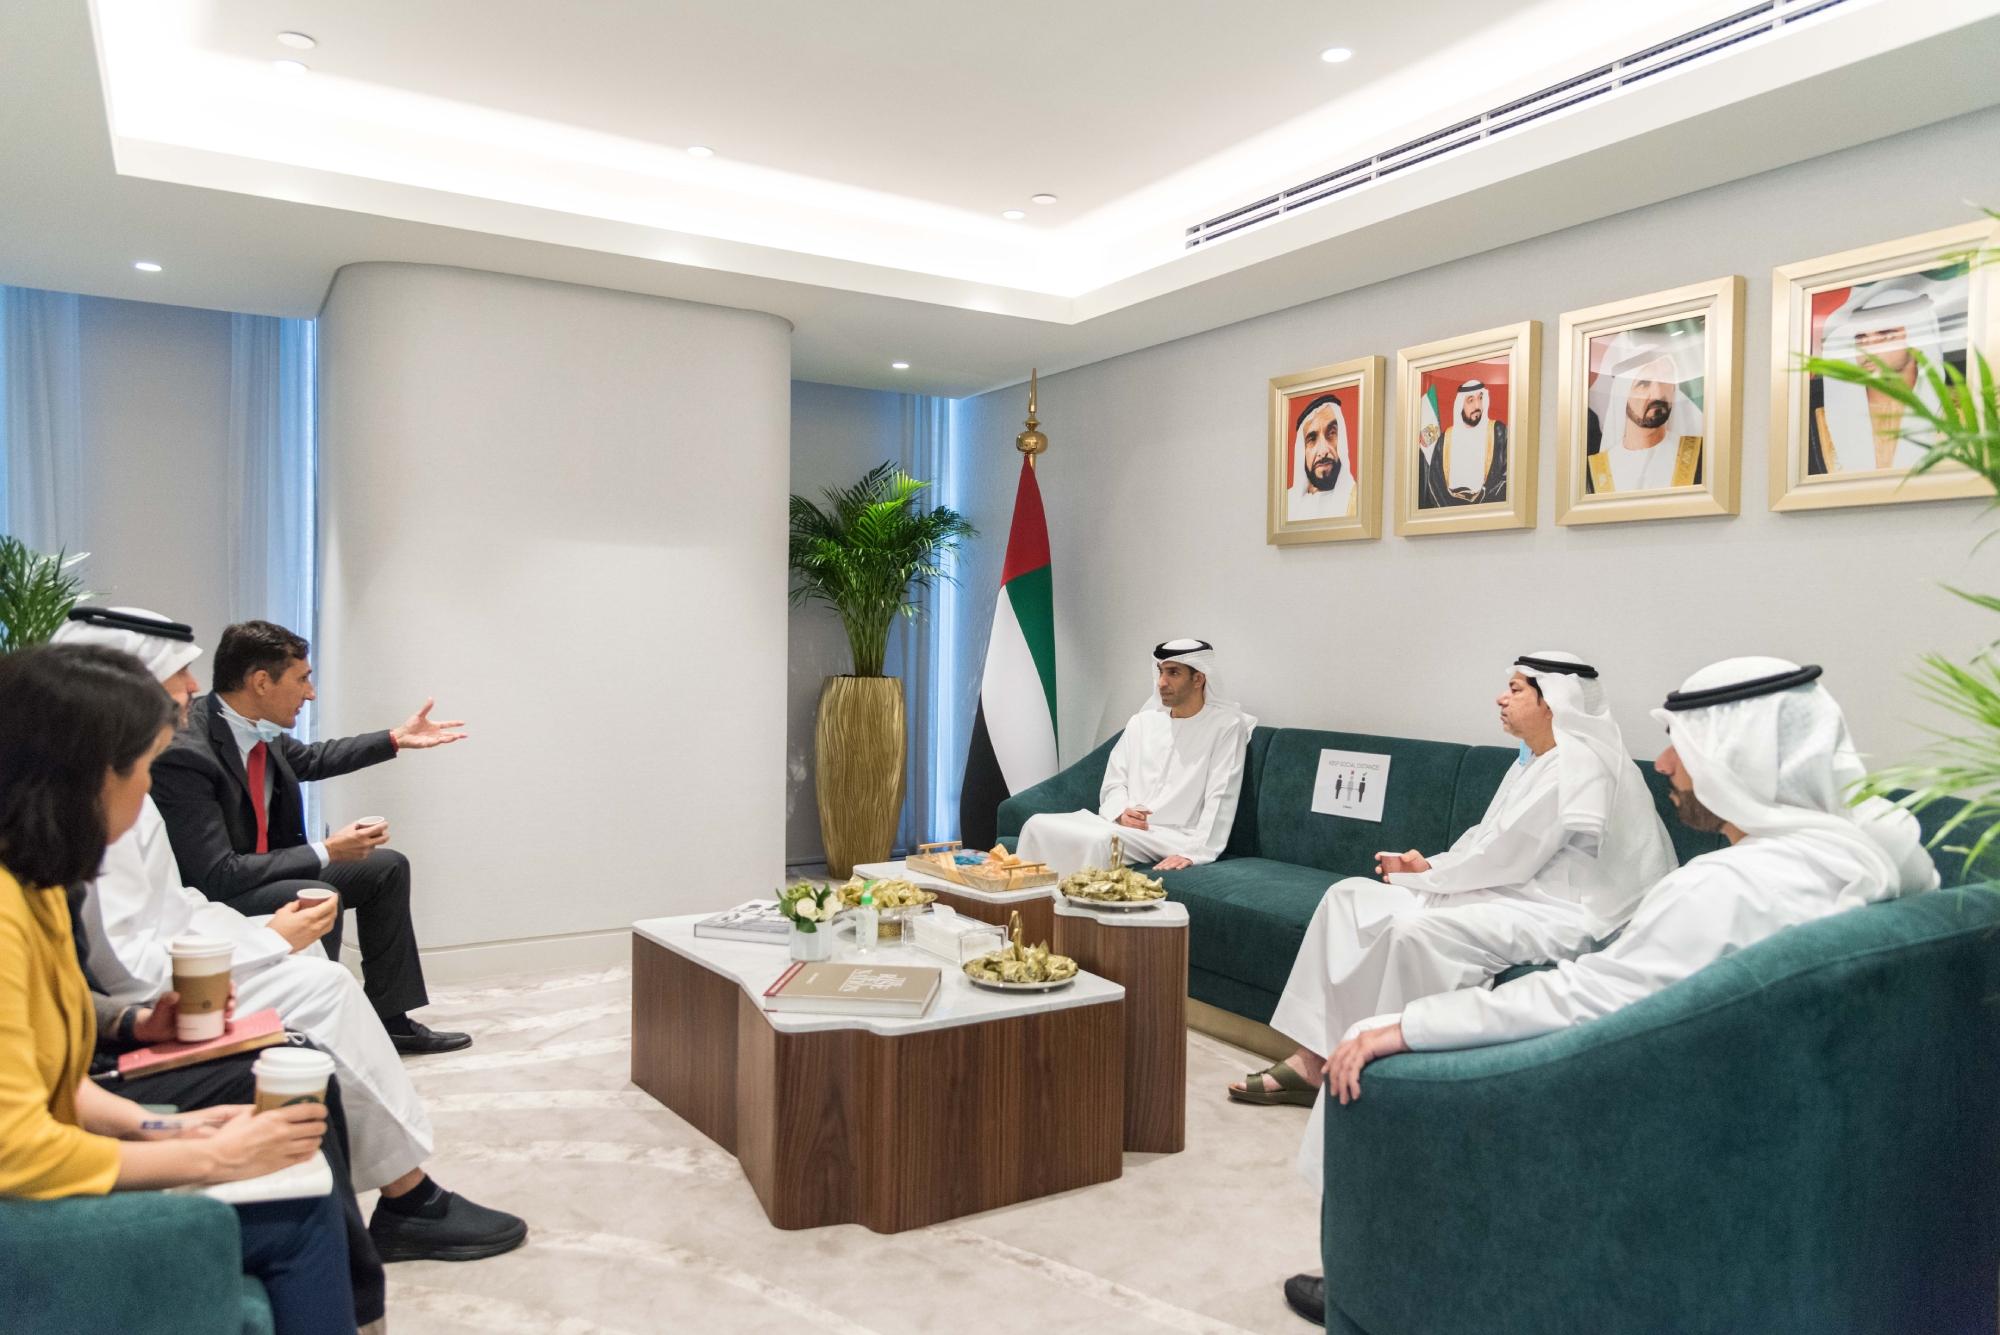 Massimo Falcioni, CEO of ECI, talking to H.E. Dr. Thani bin Ahmed Al Zeyoudi about the mandate and goals of ECI